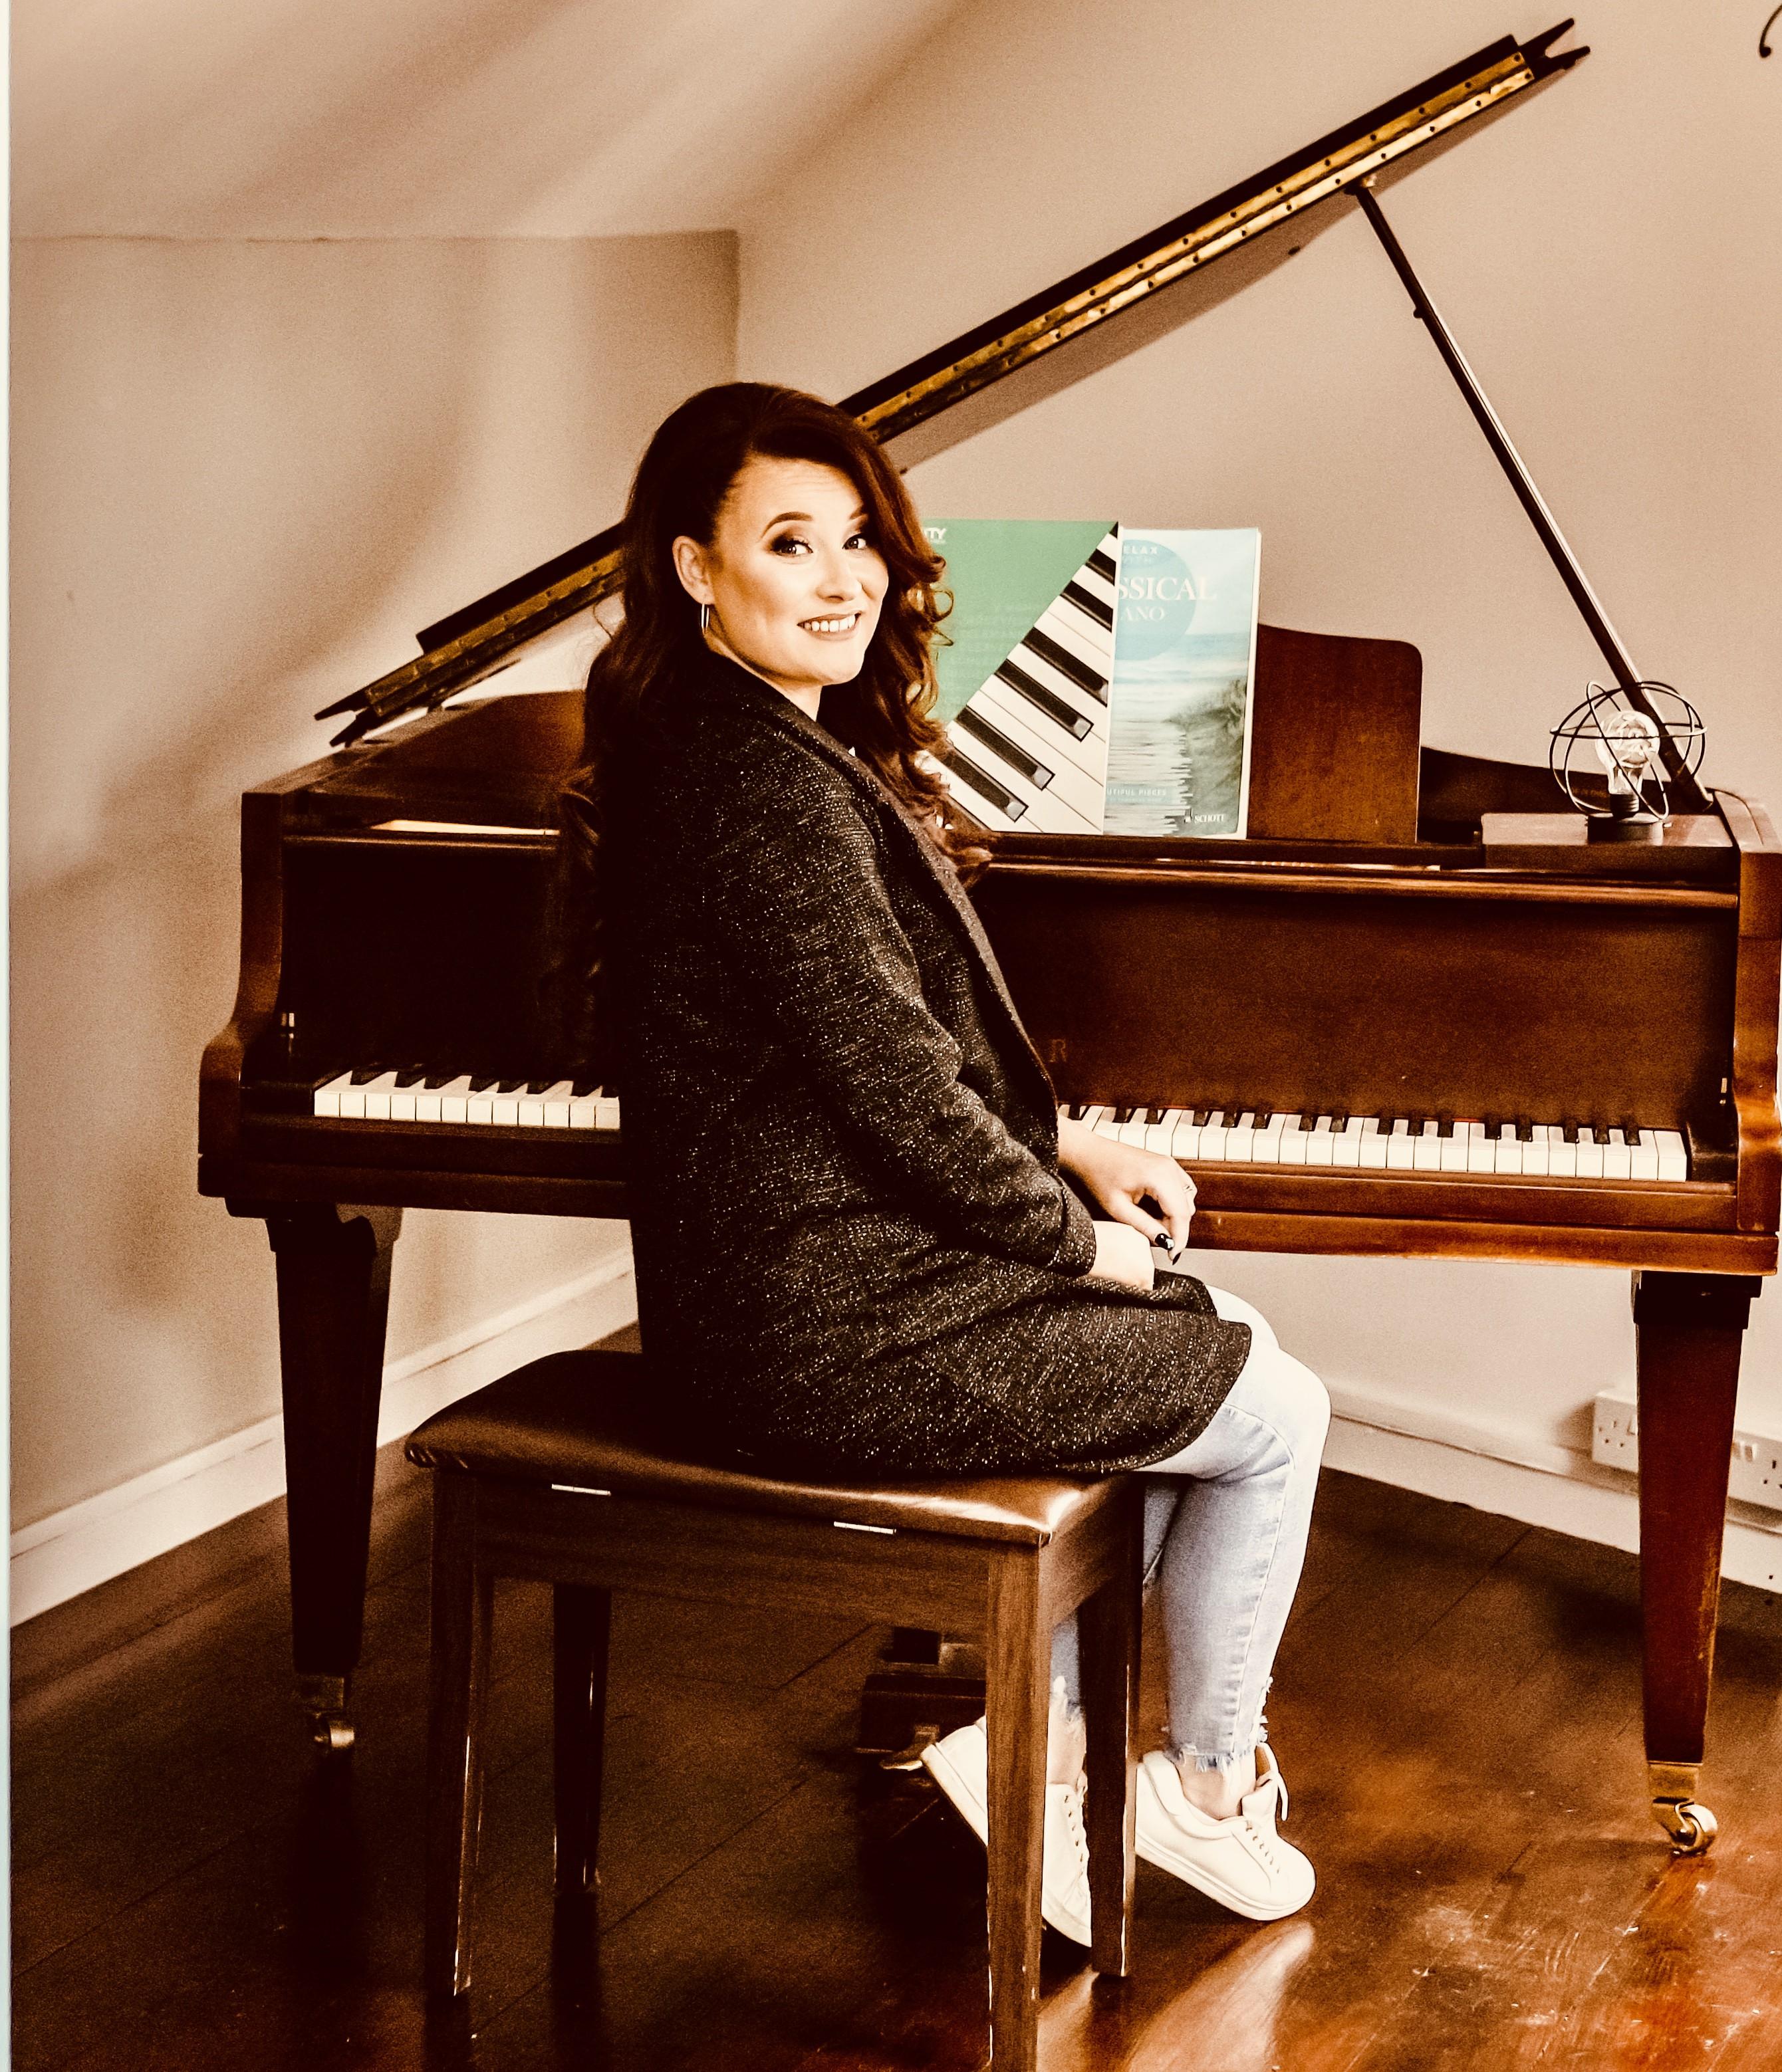 megan_louise_piano_(13_of_26)